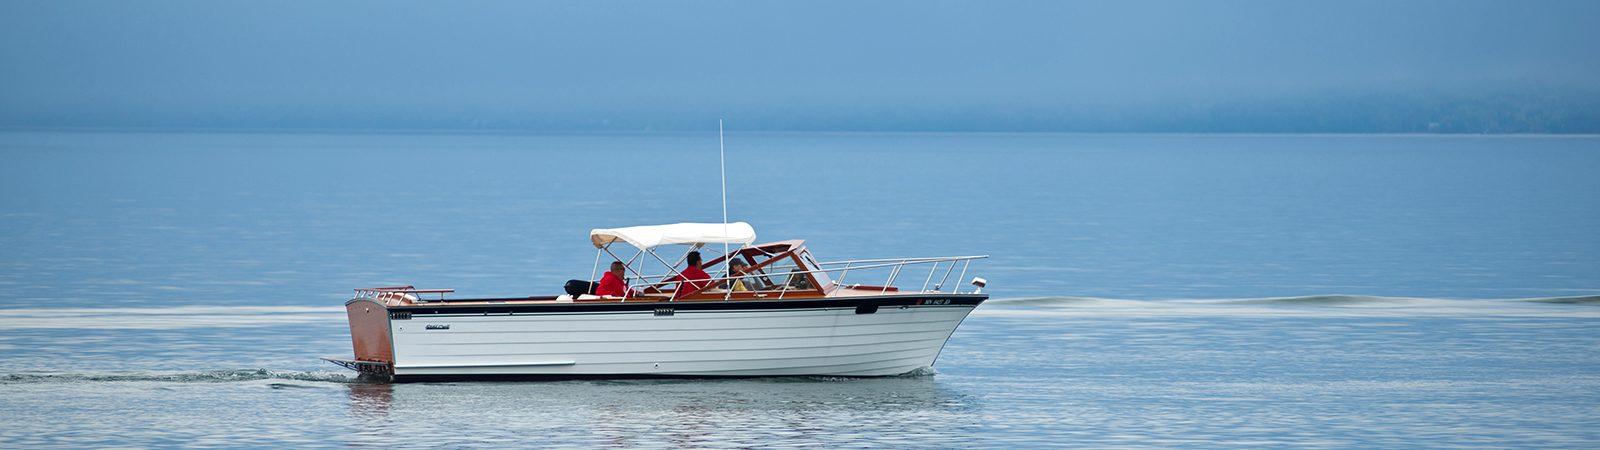 Boating on Lake Superior, Water Summit